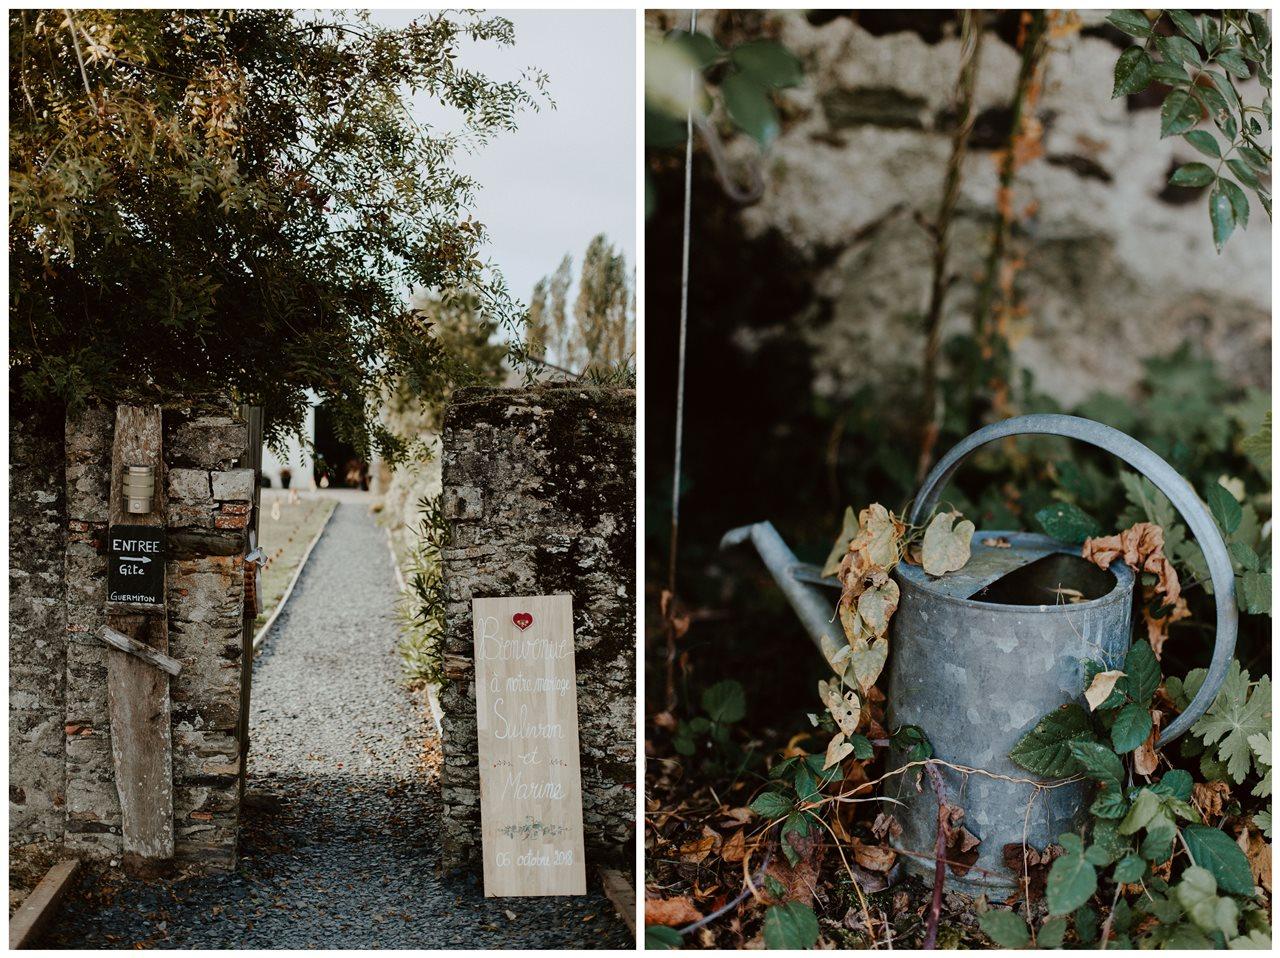 Photographie paysagage jardin guermiton arrosoir